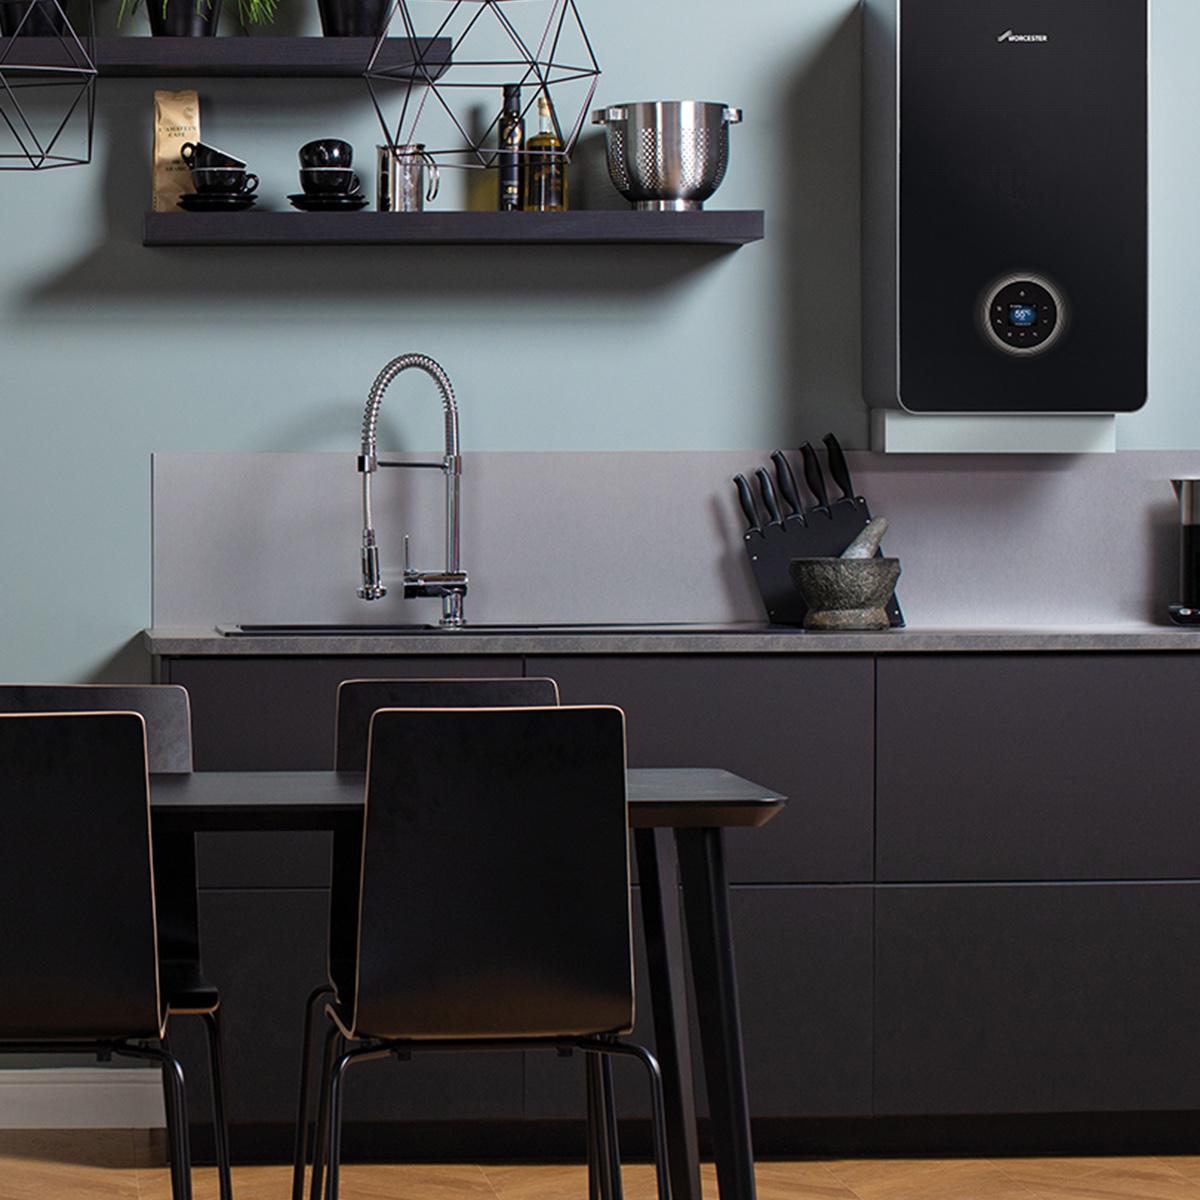 https://certifiedgasheating.co.uk/wp-content/uploads/2020/01/Style-black_kitchen_211259_RT_FB_INST-1200x1200.jpg